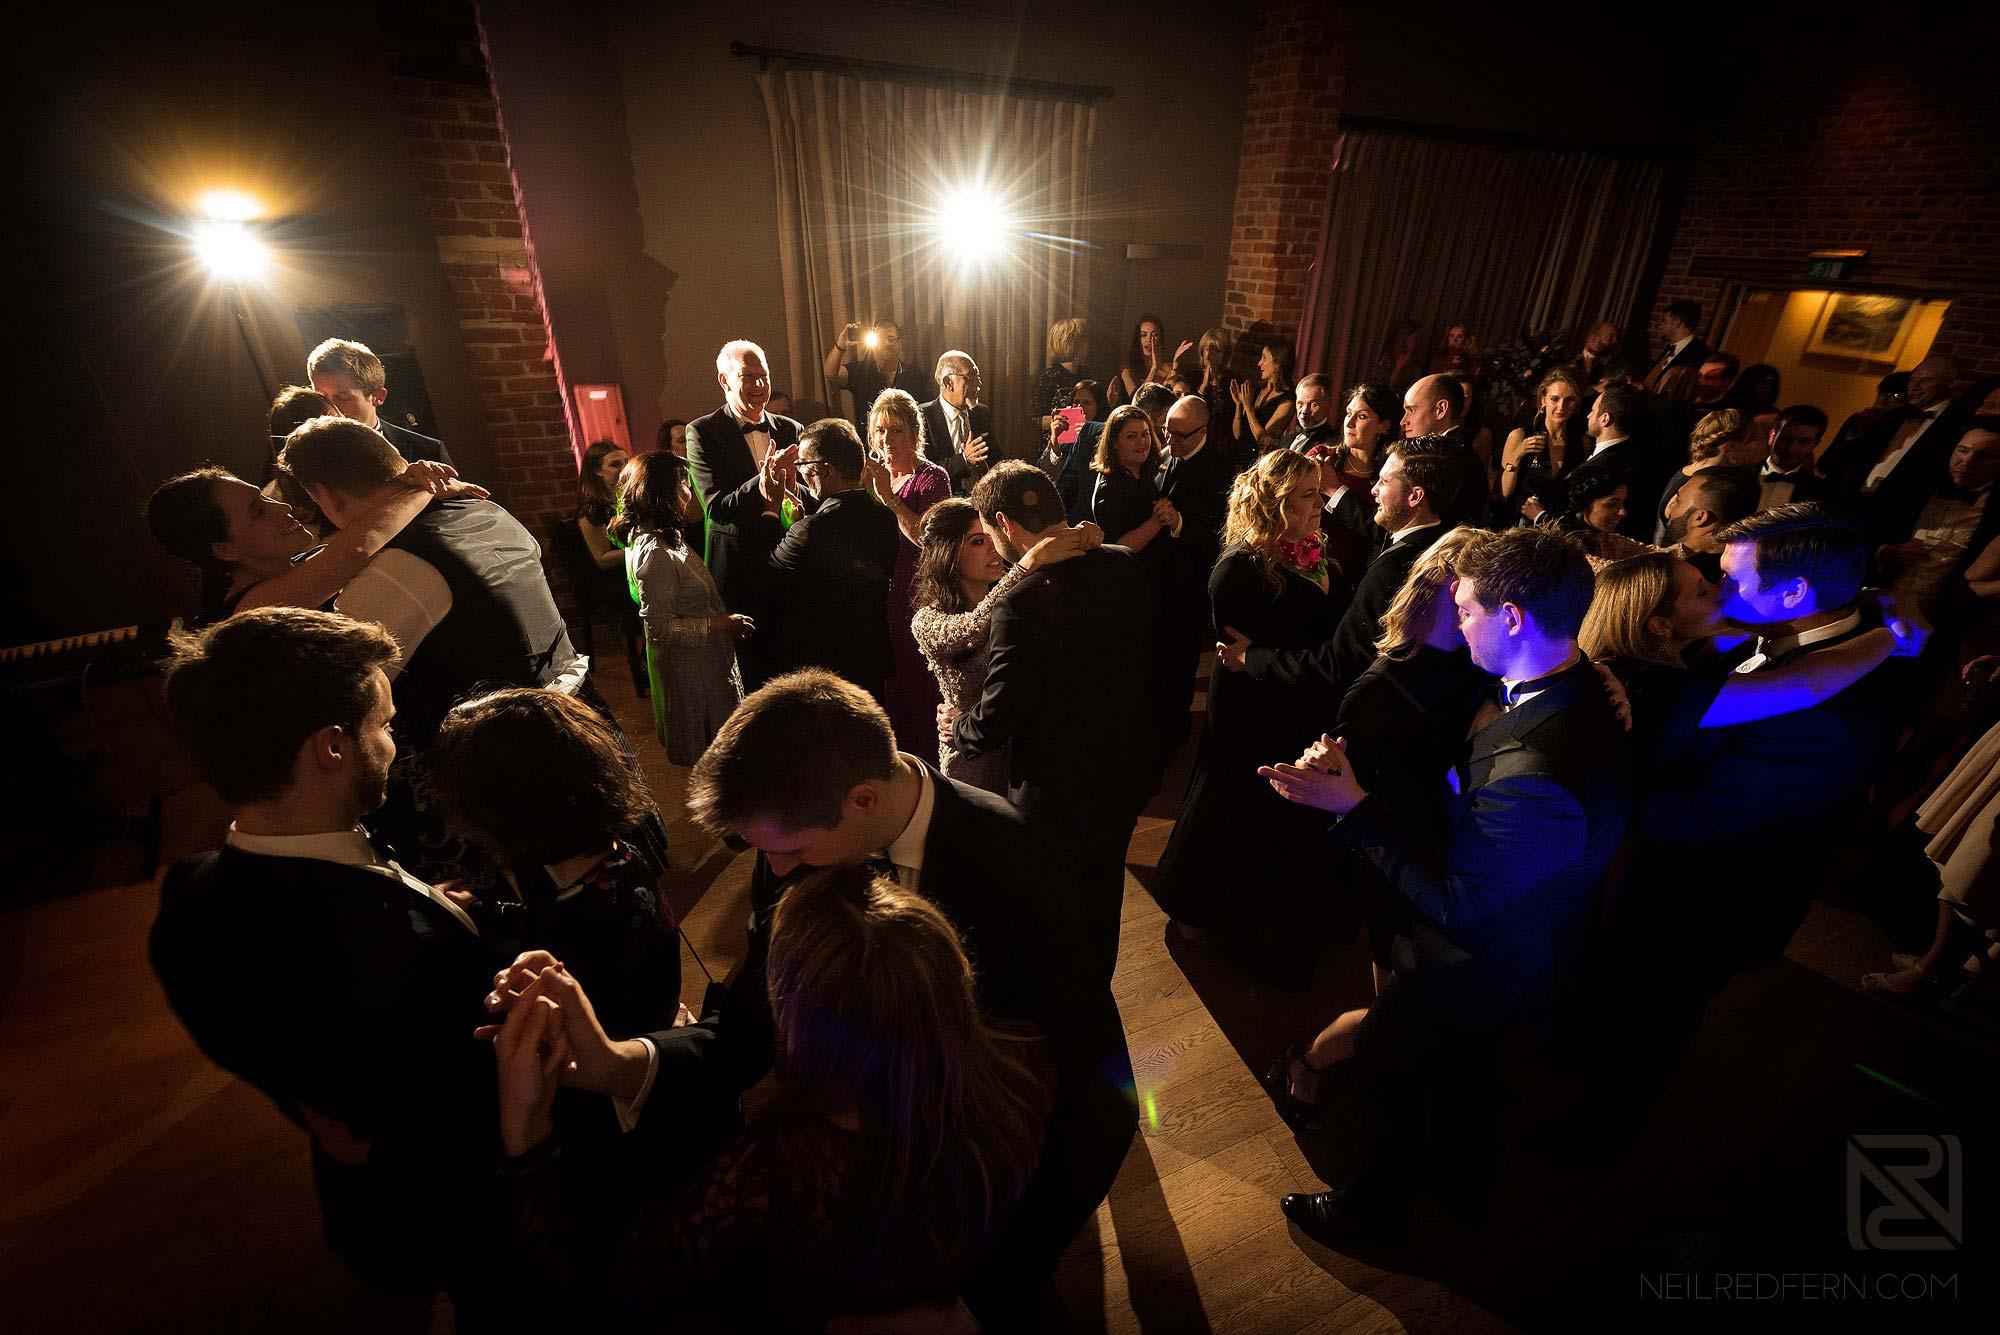 packed dance floor at Arley Hall wedding